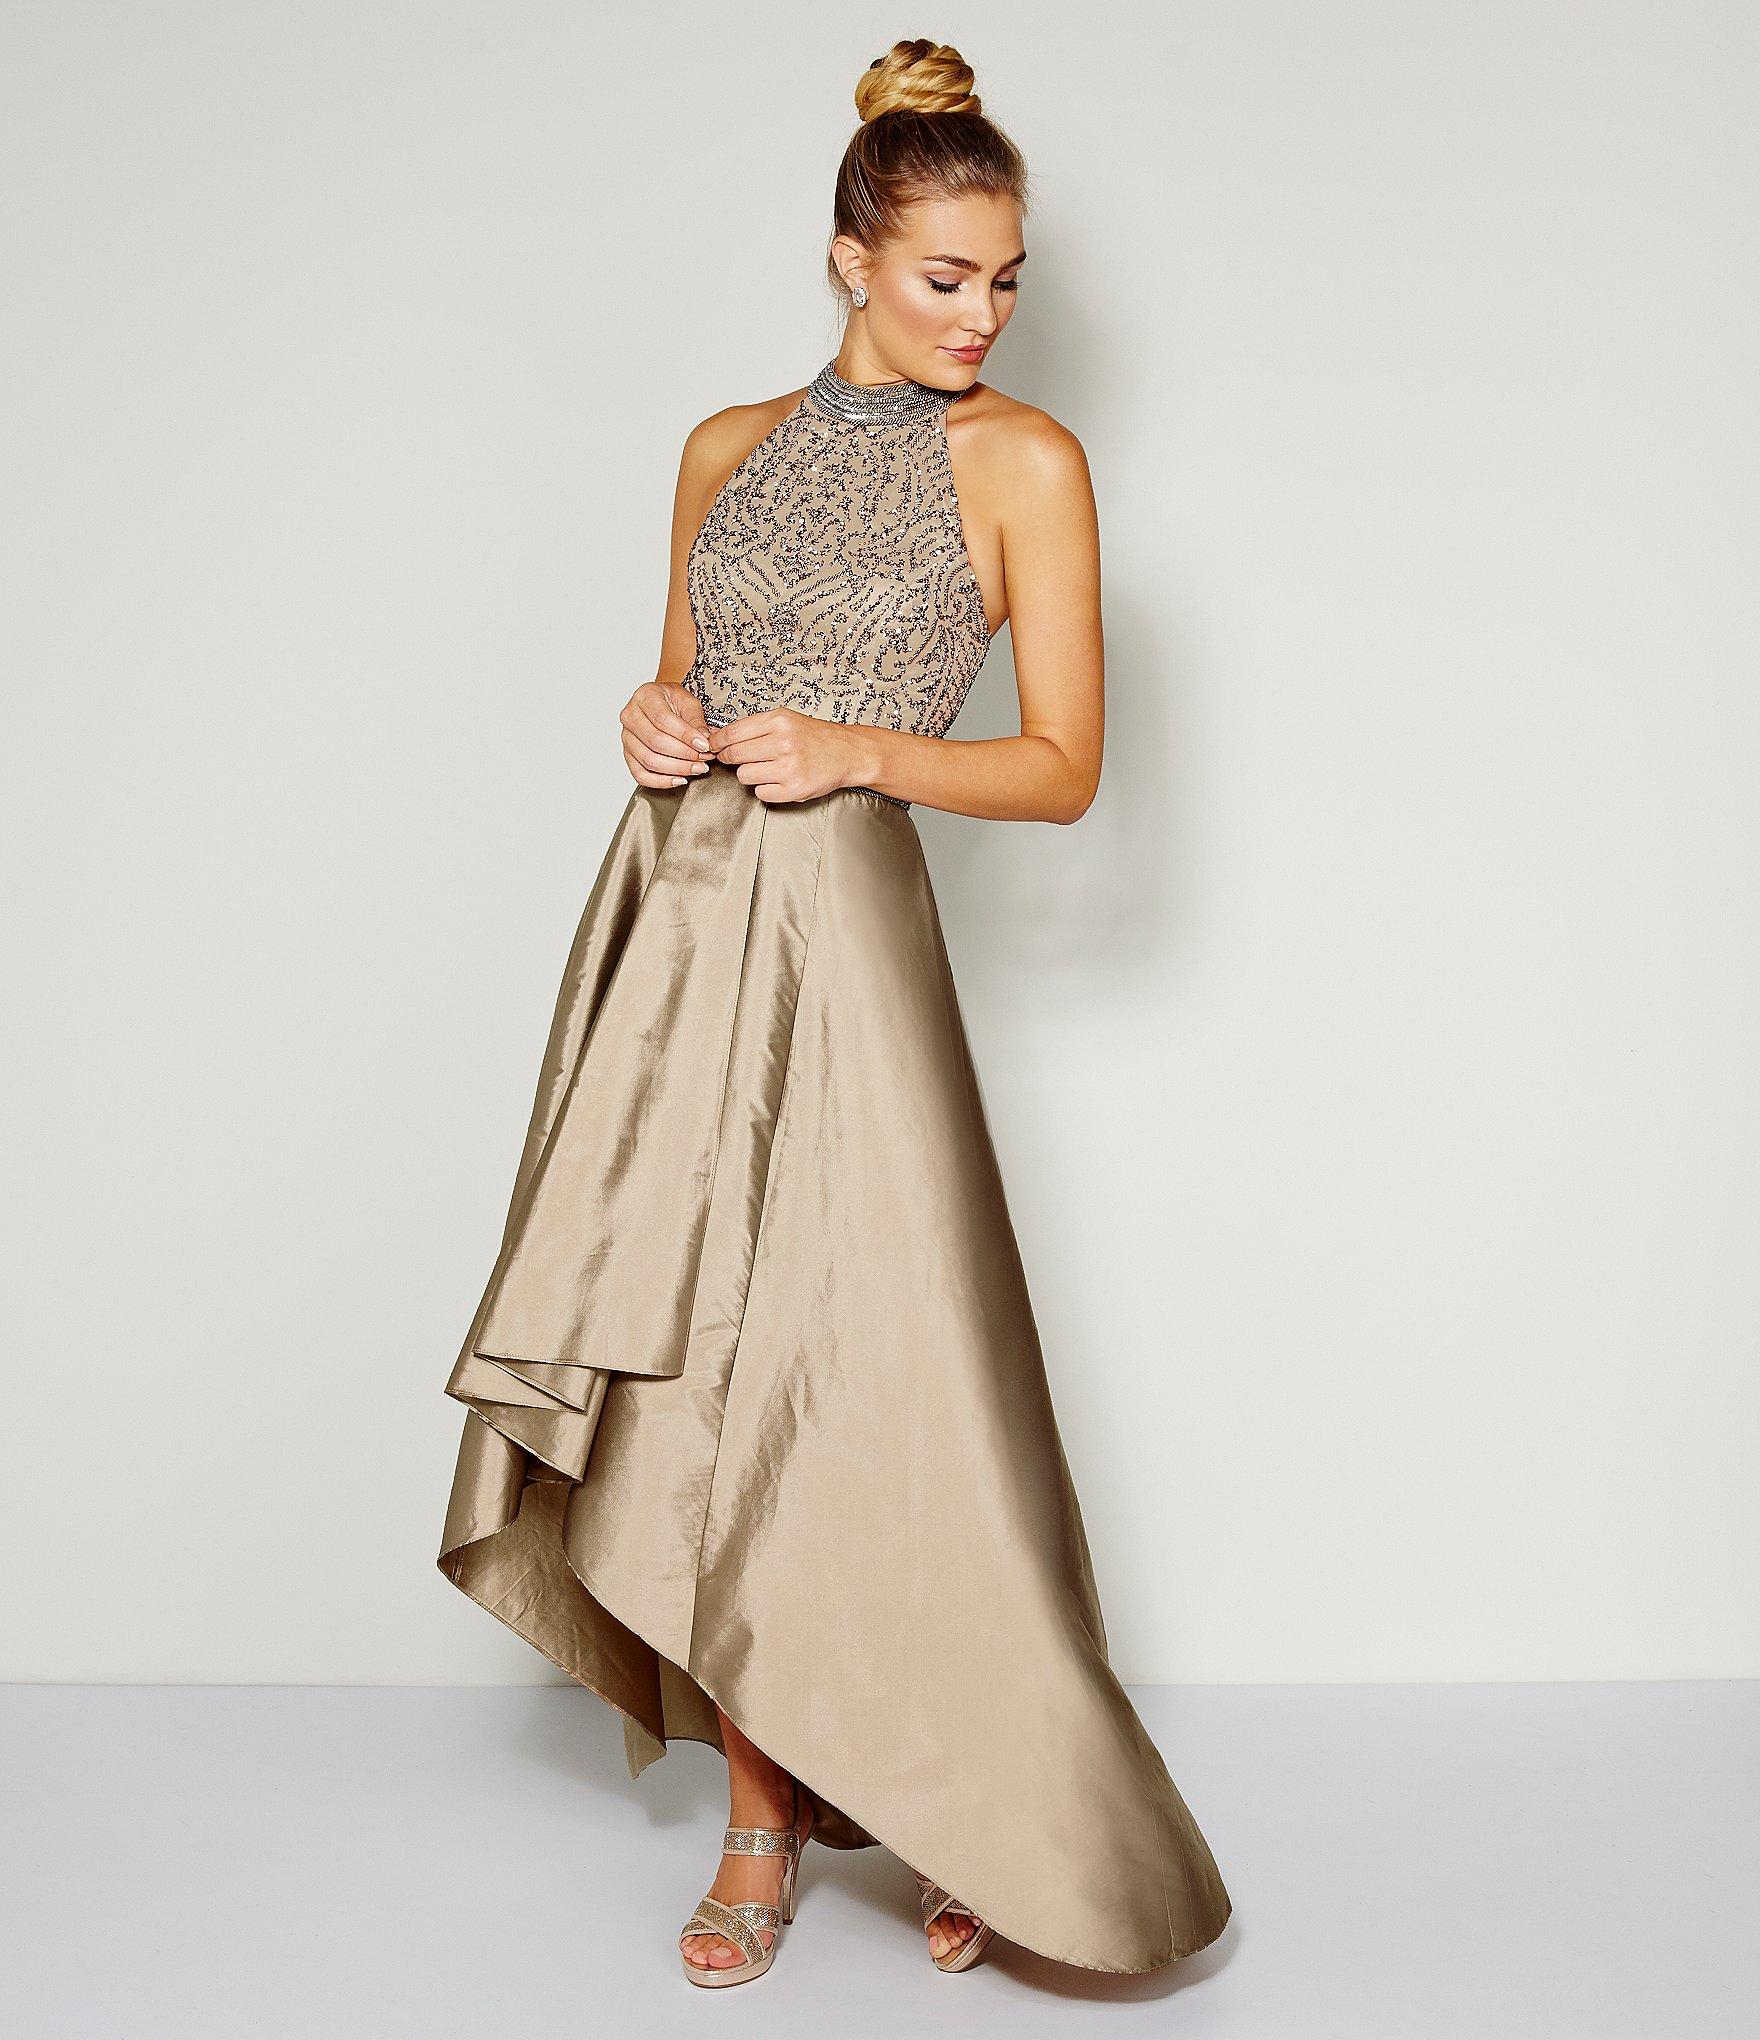 4d9012d58df Adrianna Papell Beaded Halter Hi-low Gown in Metallic - Lyst